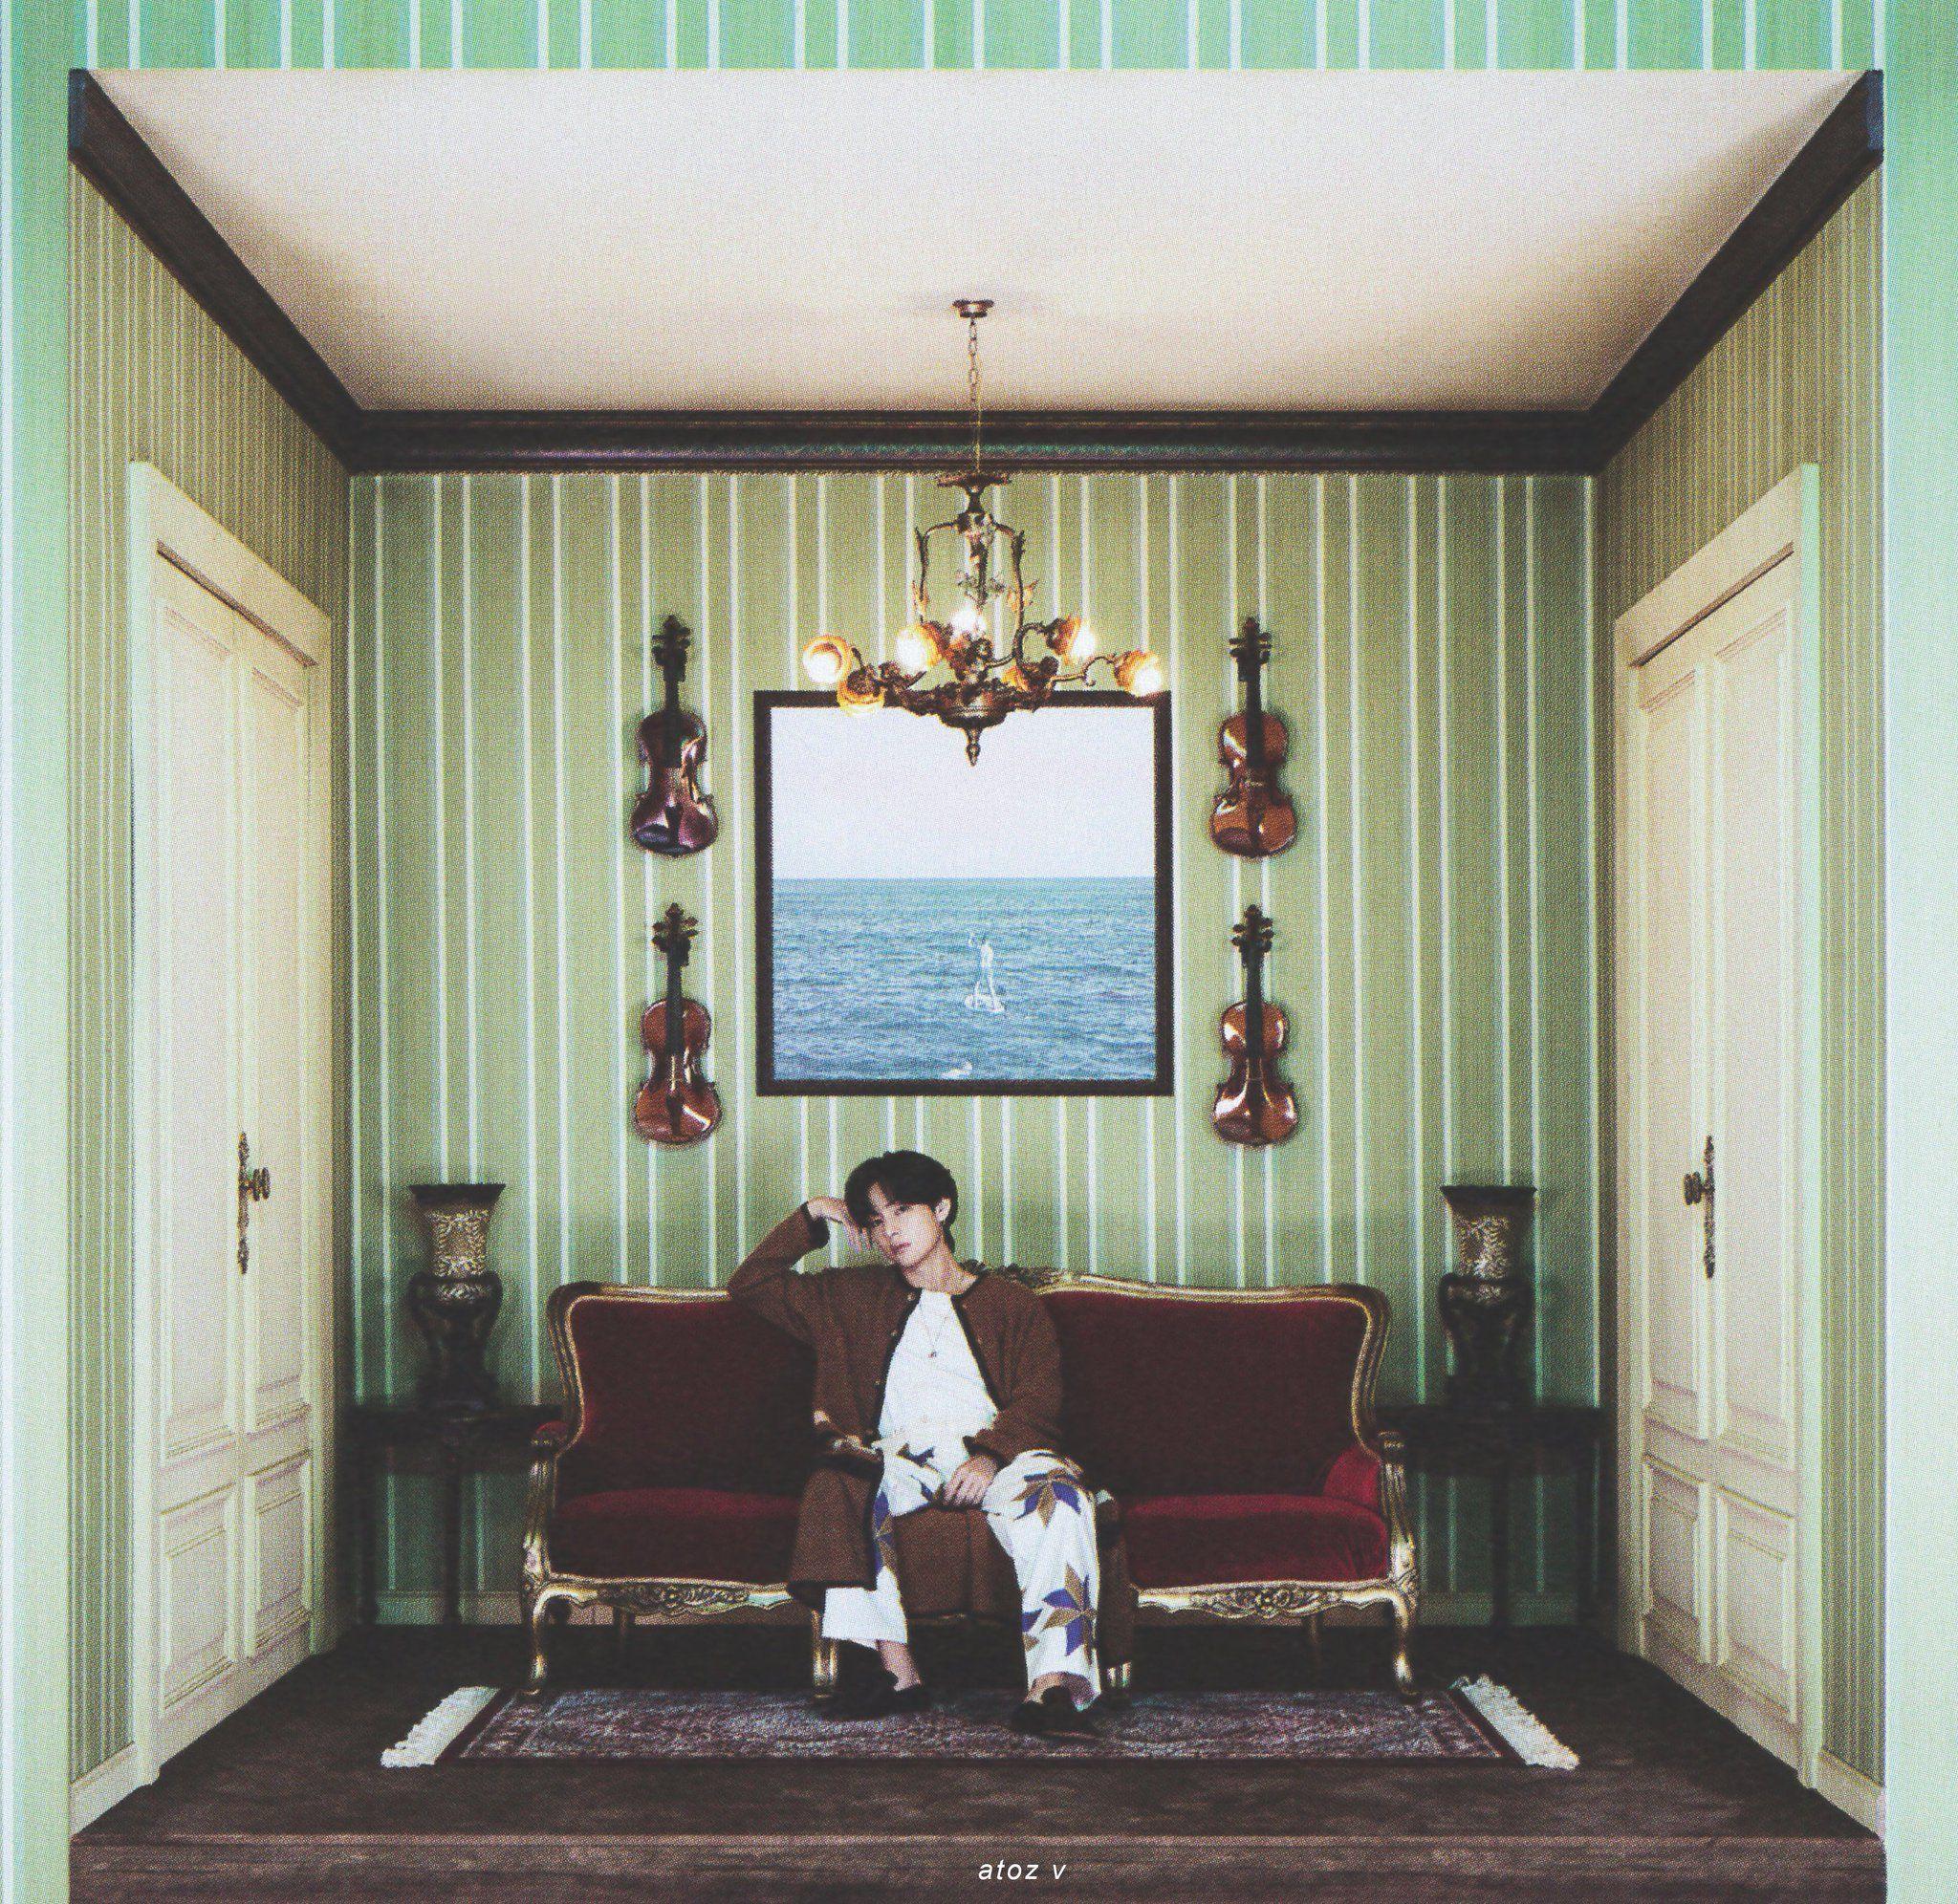 Atoz V On Twitter In 2021 Kim Taehyung Bangtan V Taehyung Luxury bts room photo